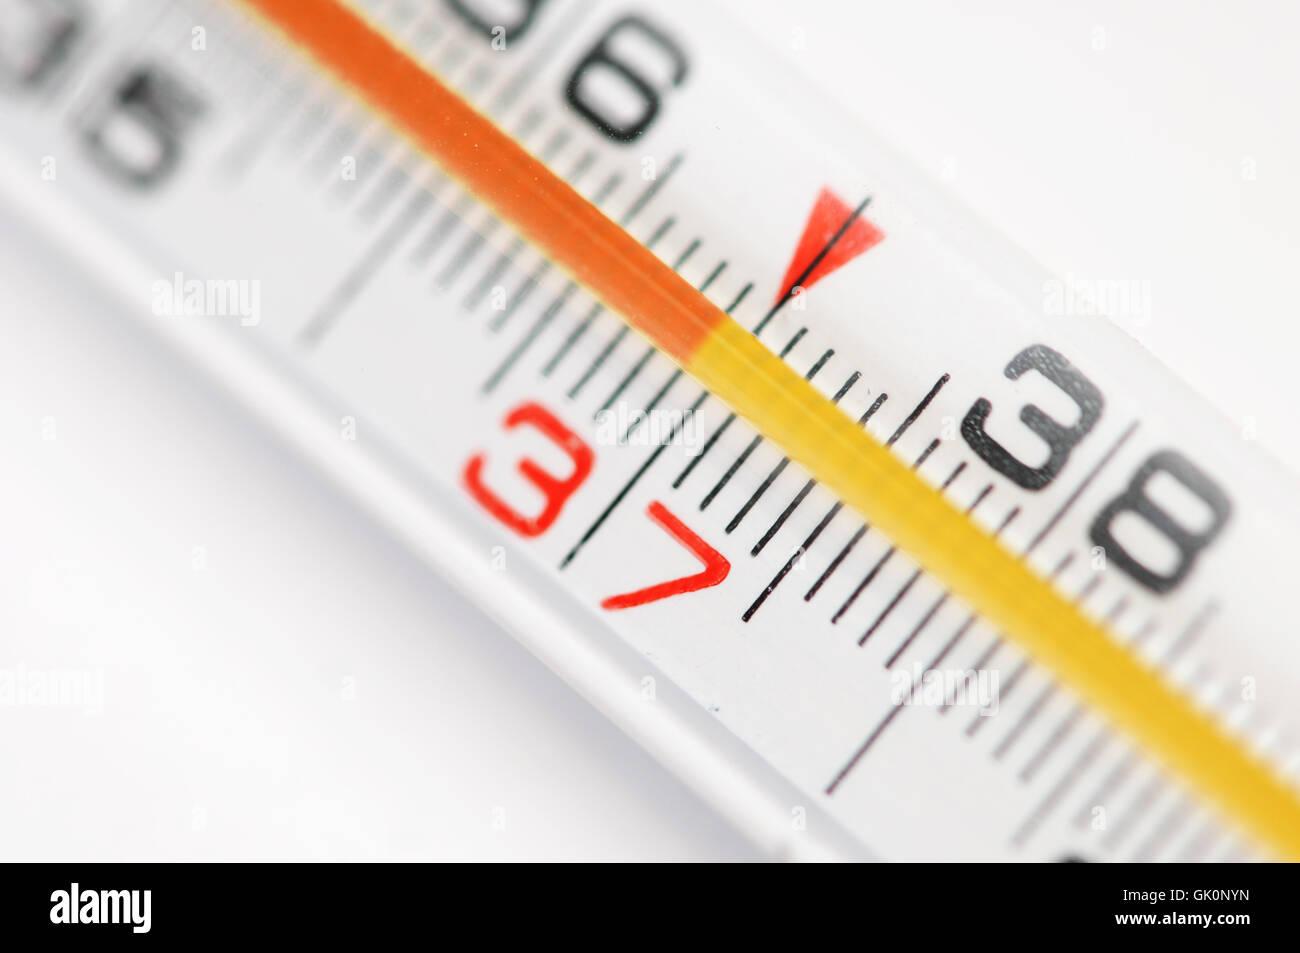 measurement temperature thermometer - Stock Image